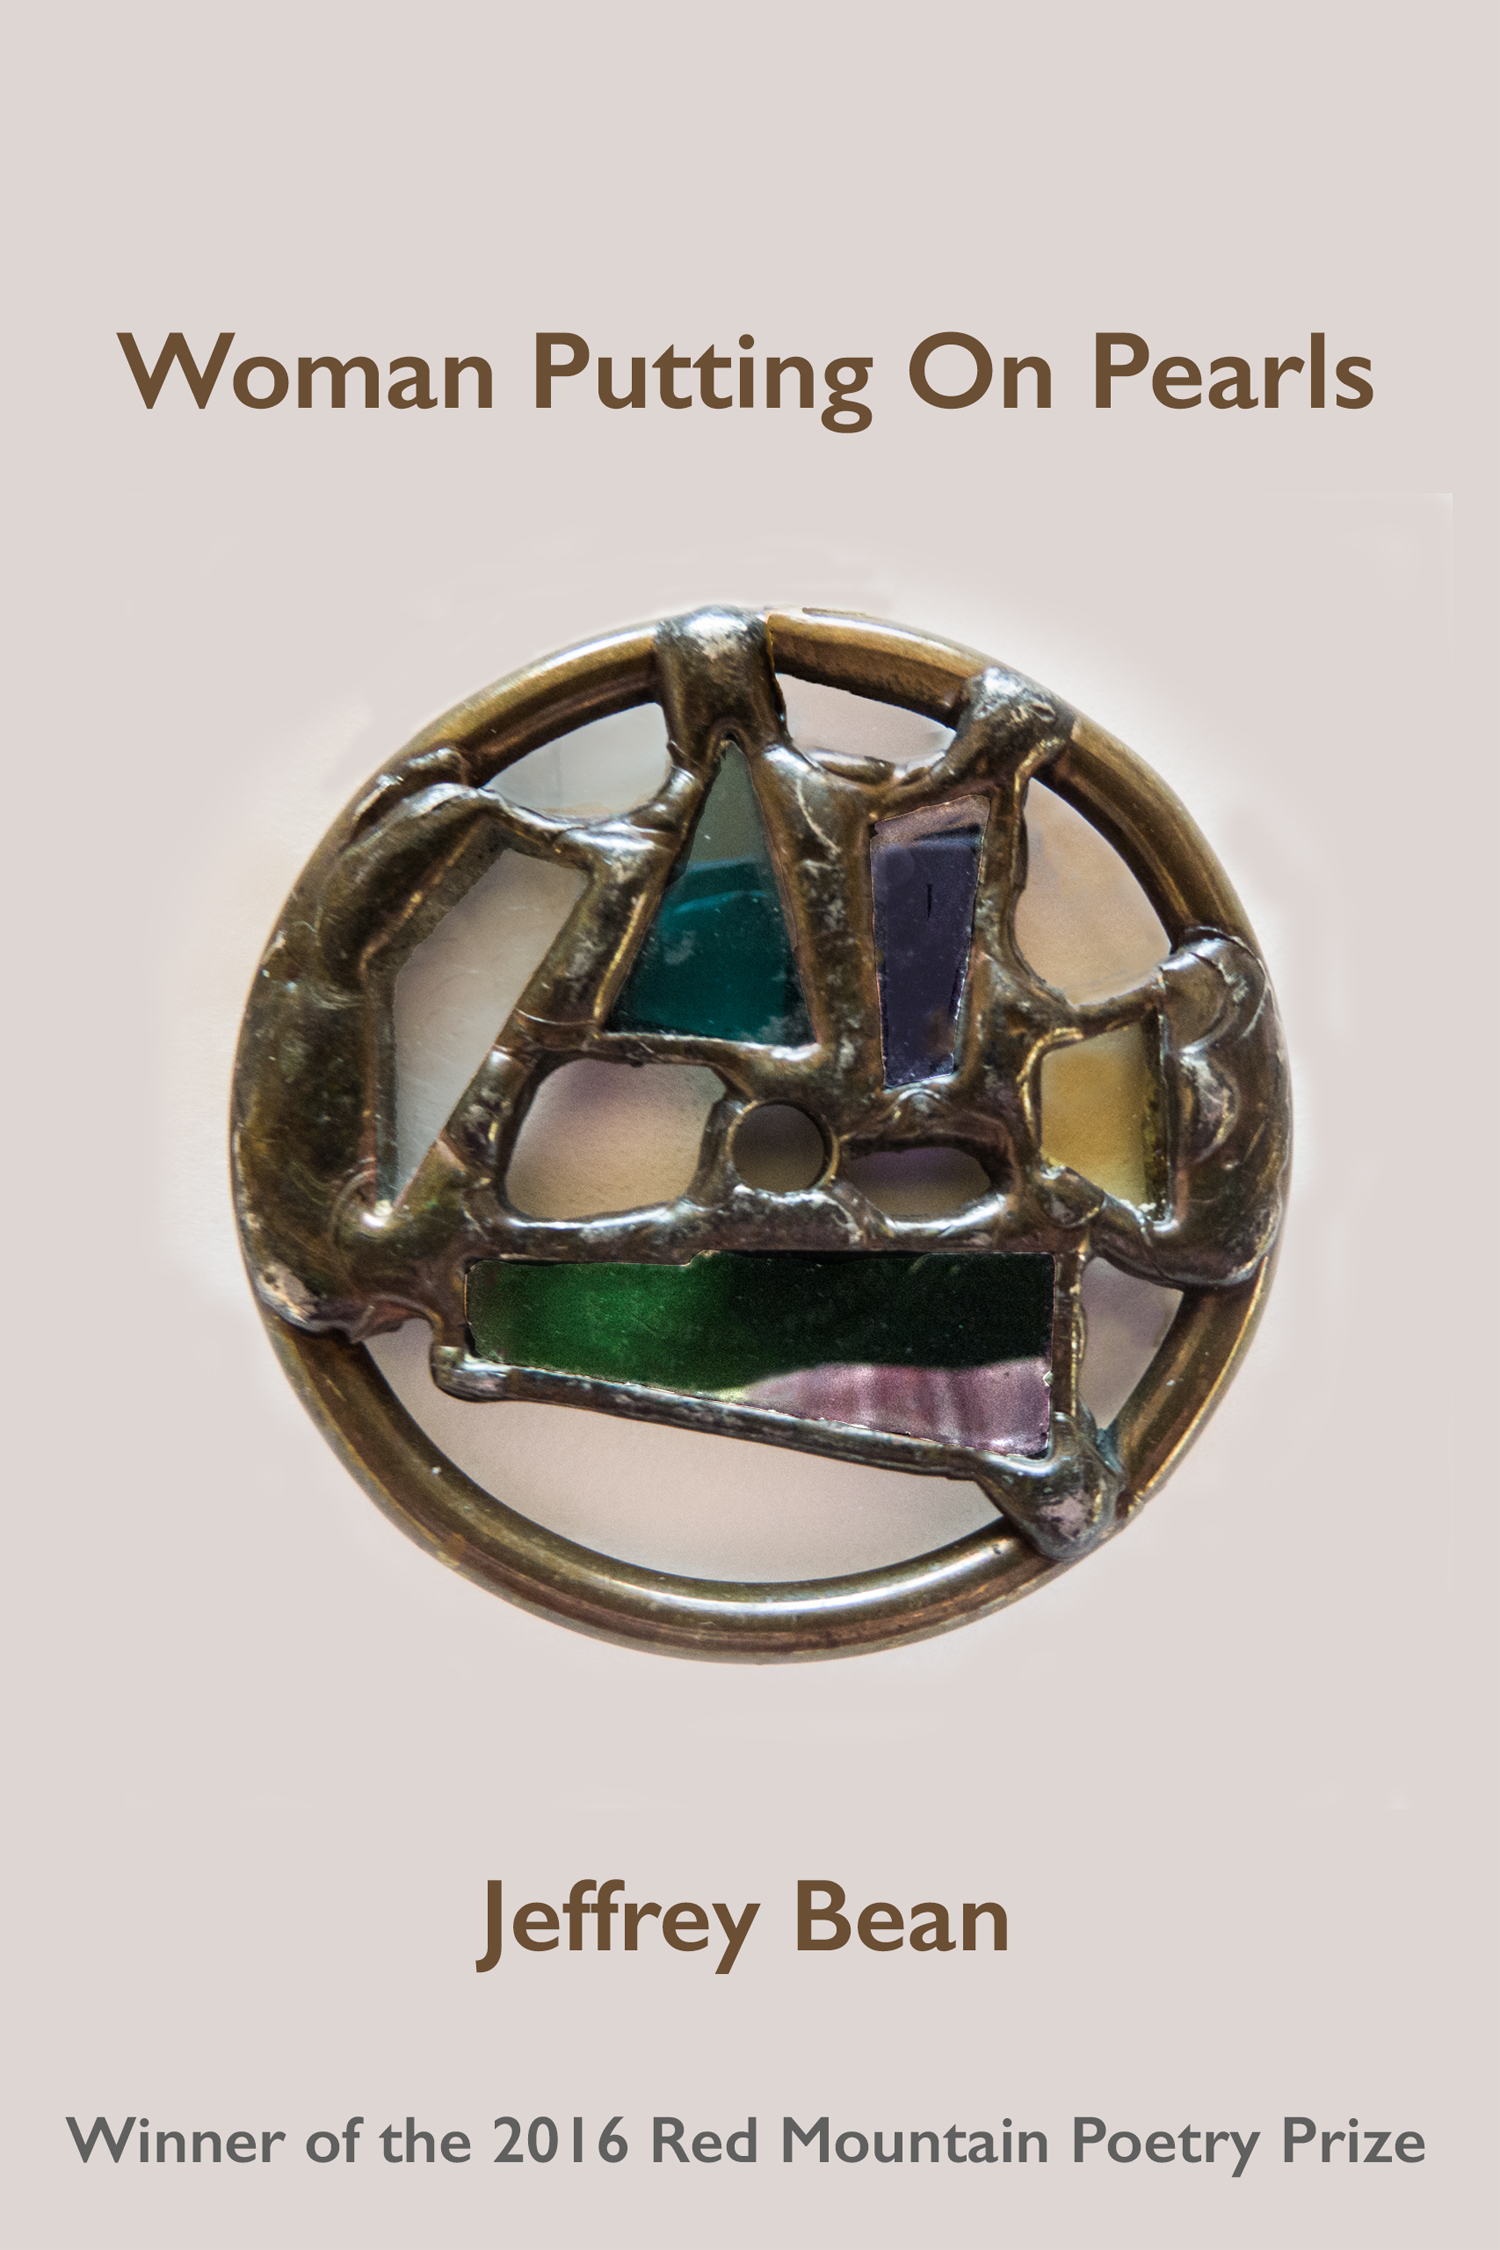 Woman Putting on Pearls Jeffery Bean